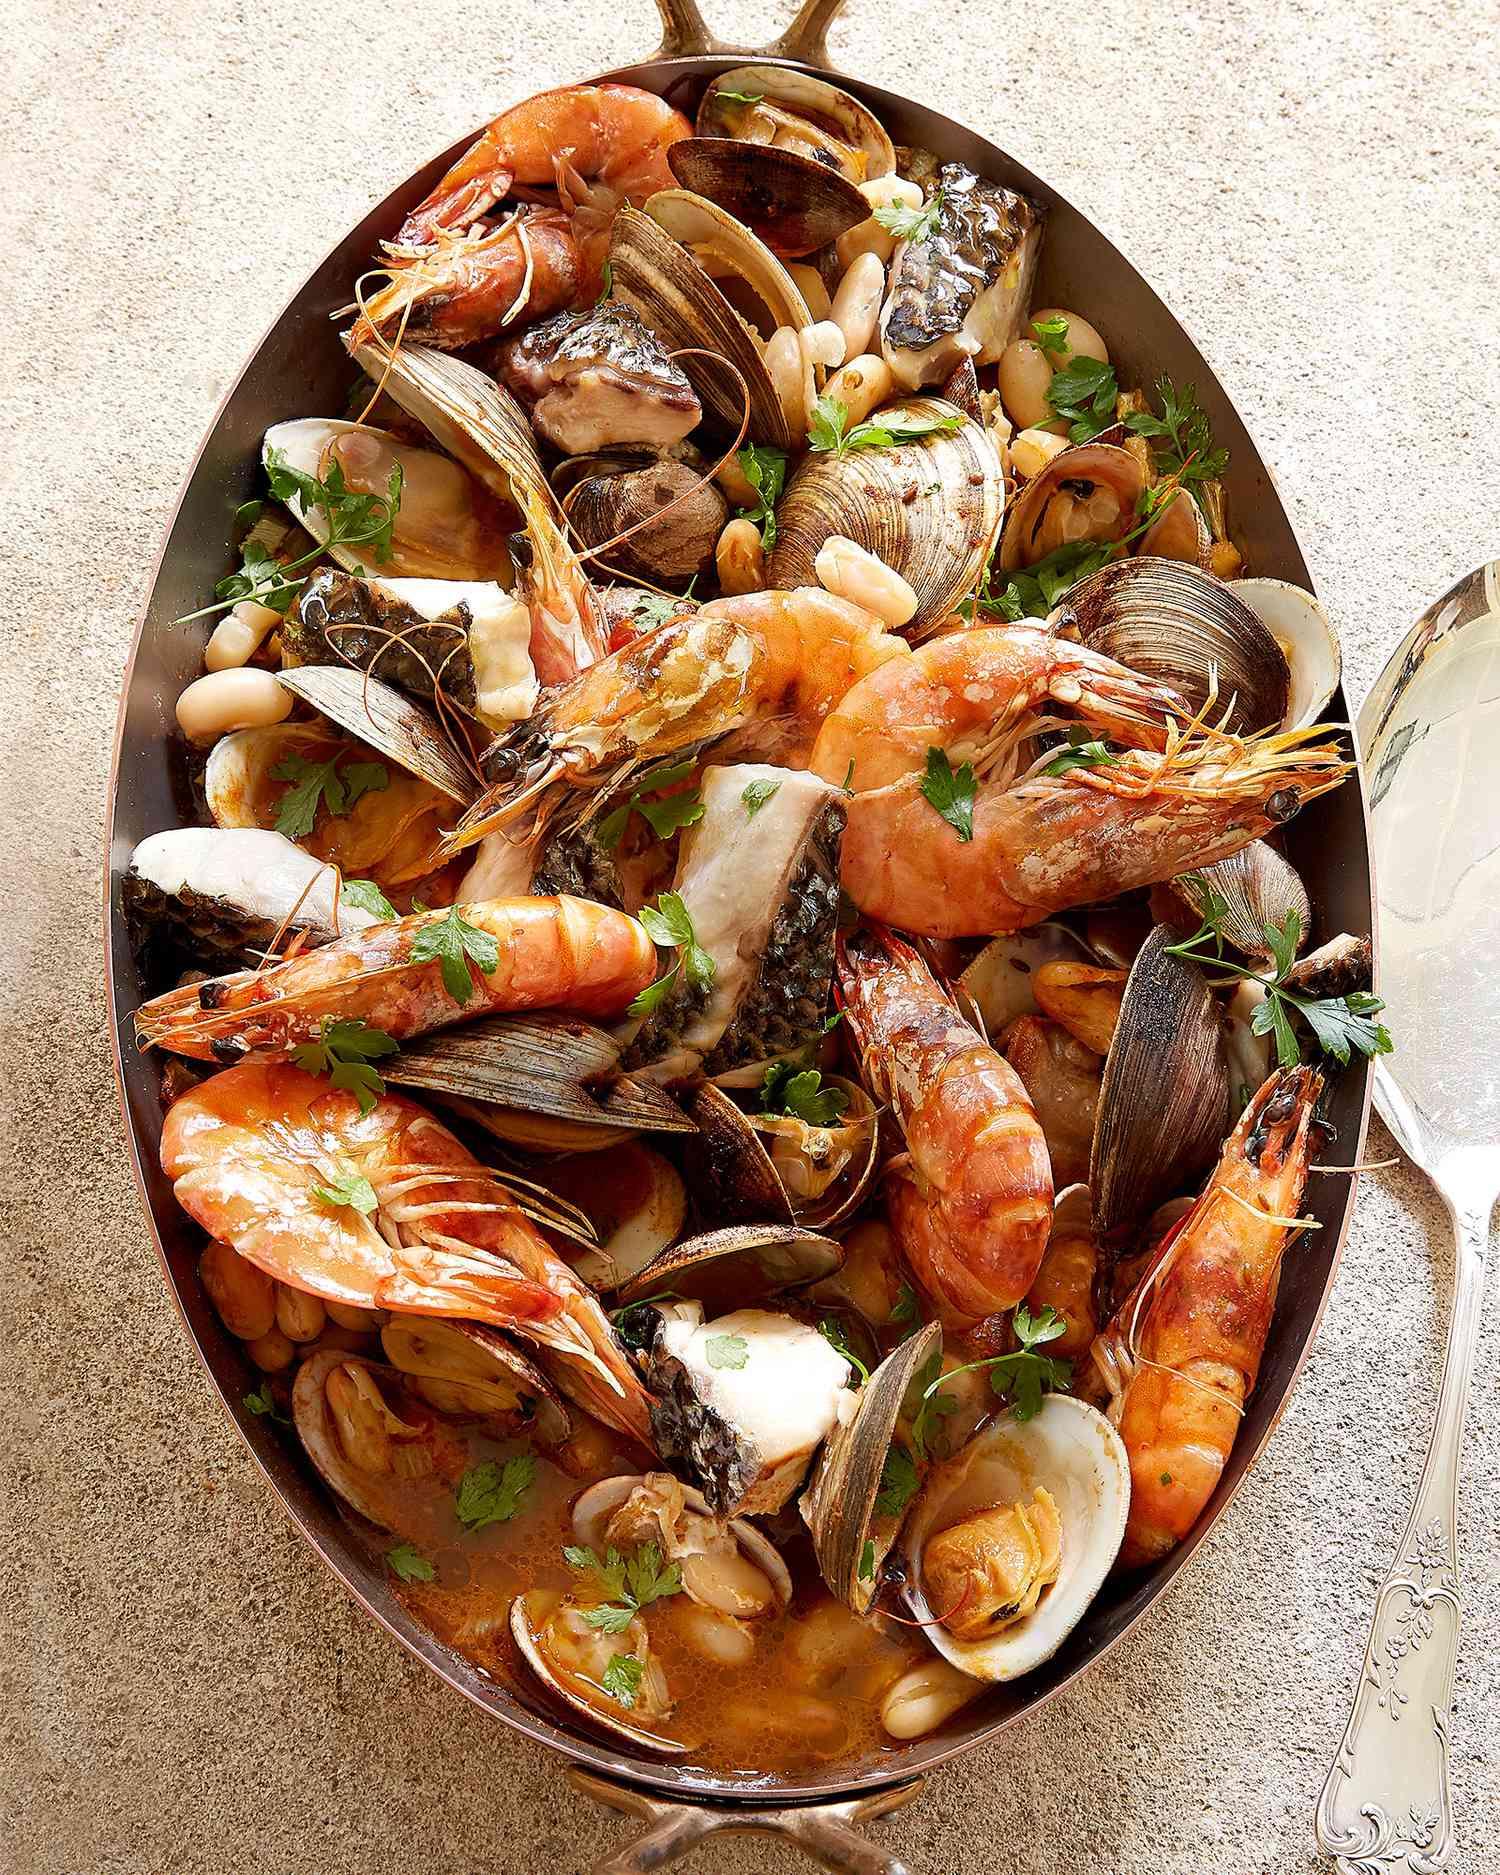 Seafood Christmas Food Ideas : seafood, christmas, ideas, Seafood, Recipes, Great, Options, Entertaining, Martha, Stewart